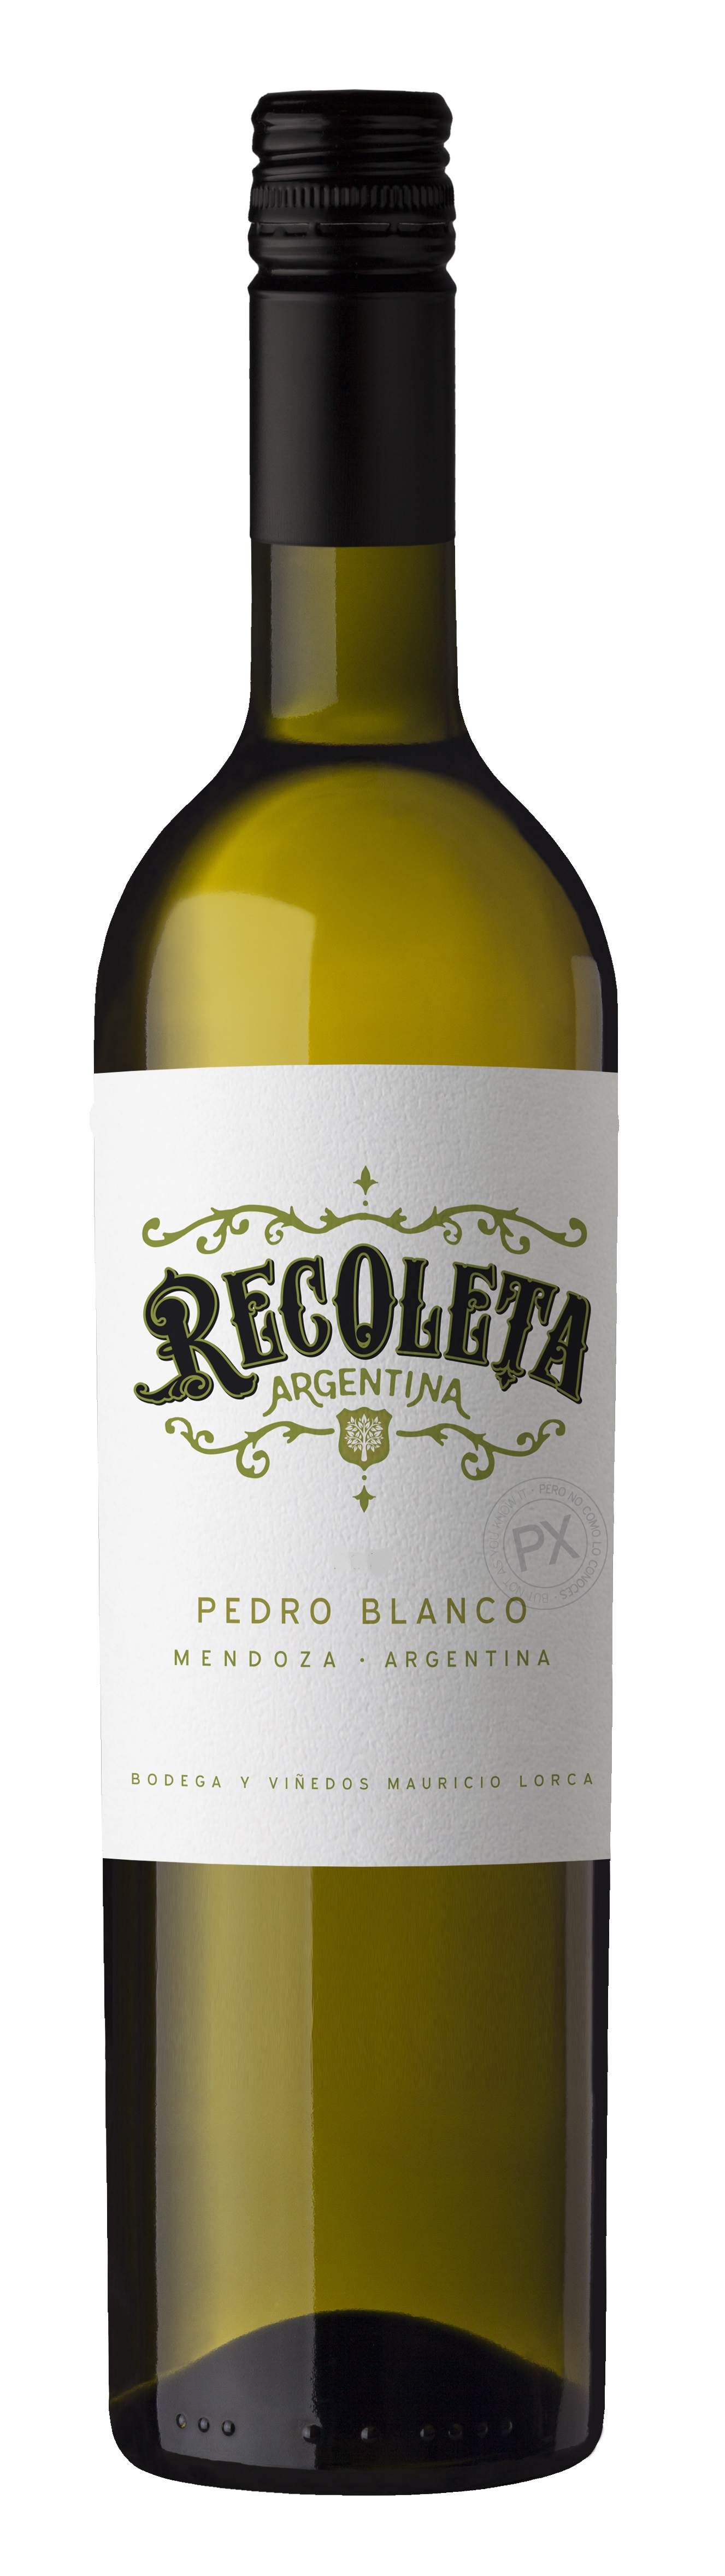 Recoleta Pedro Blanco (PX)